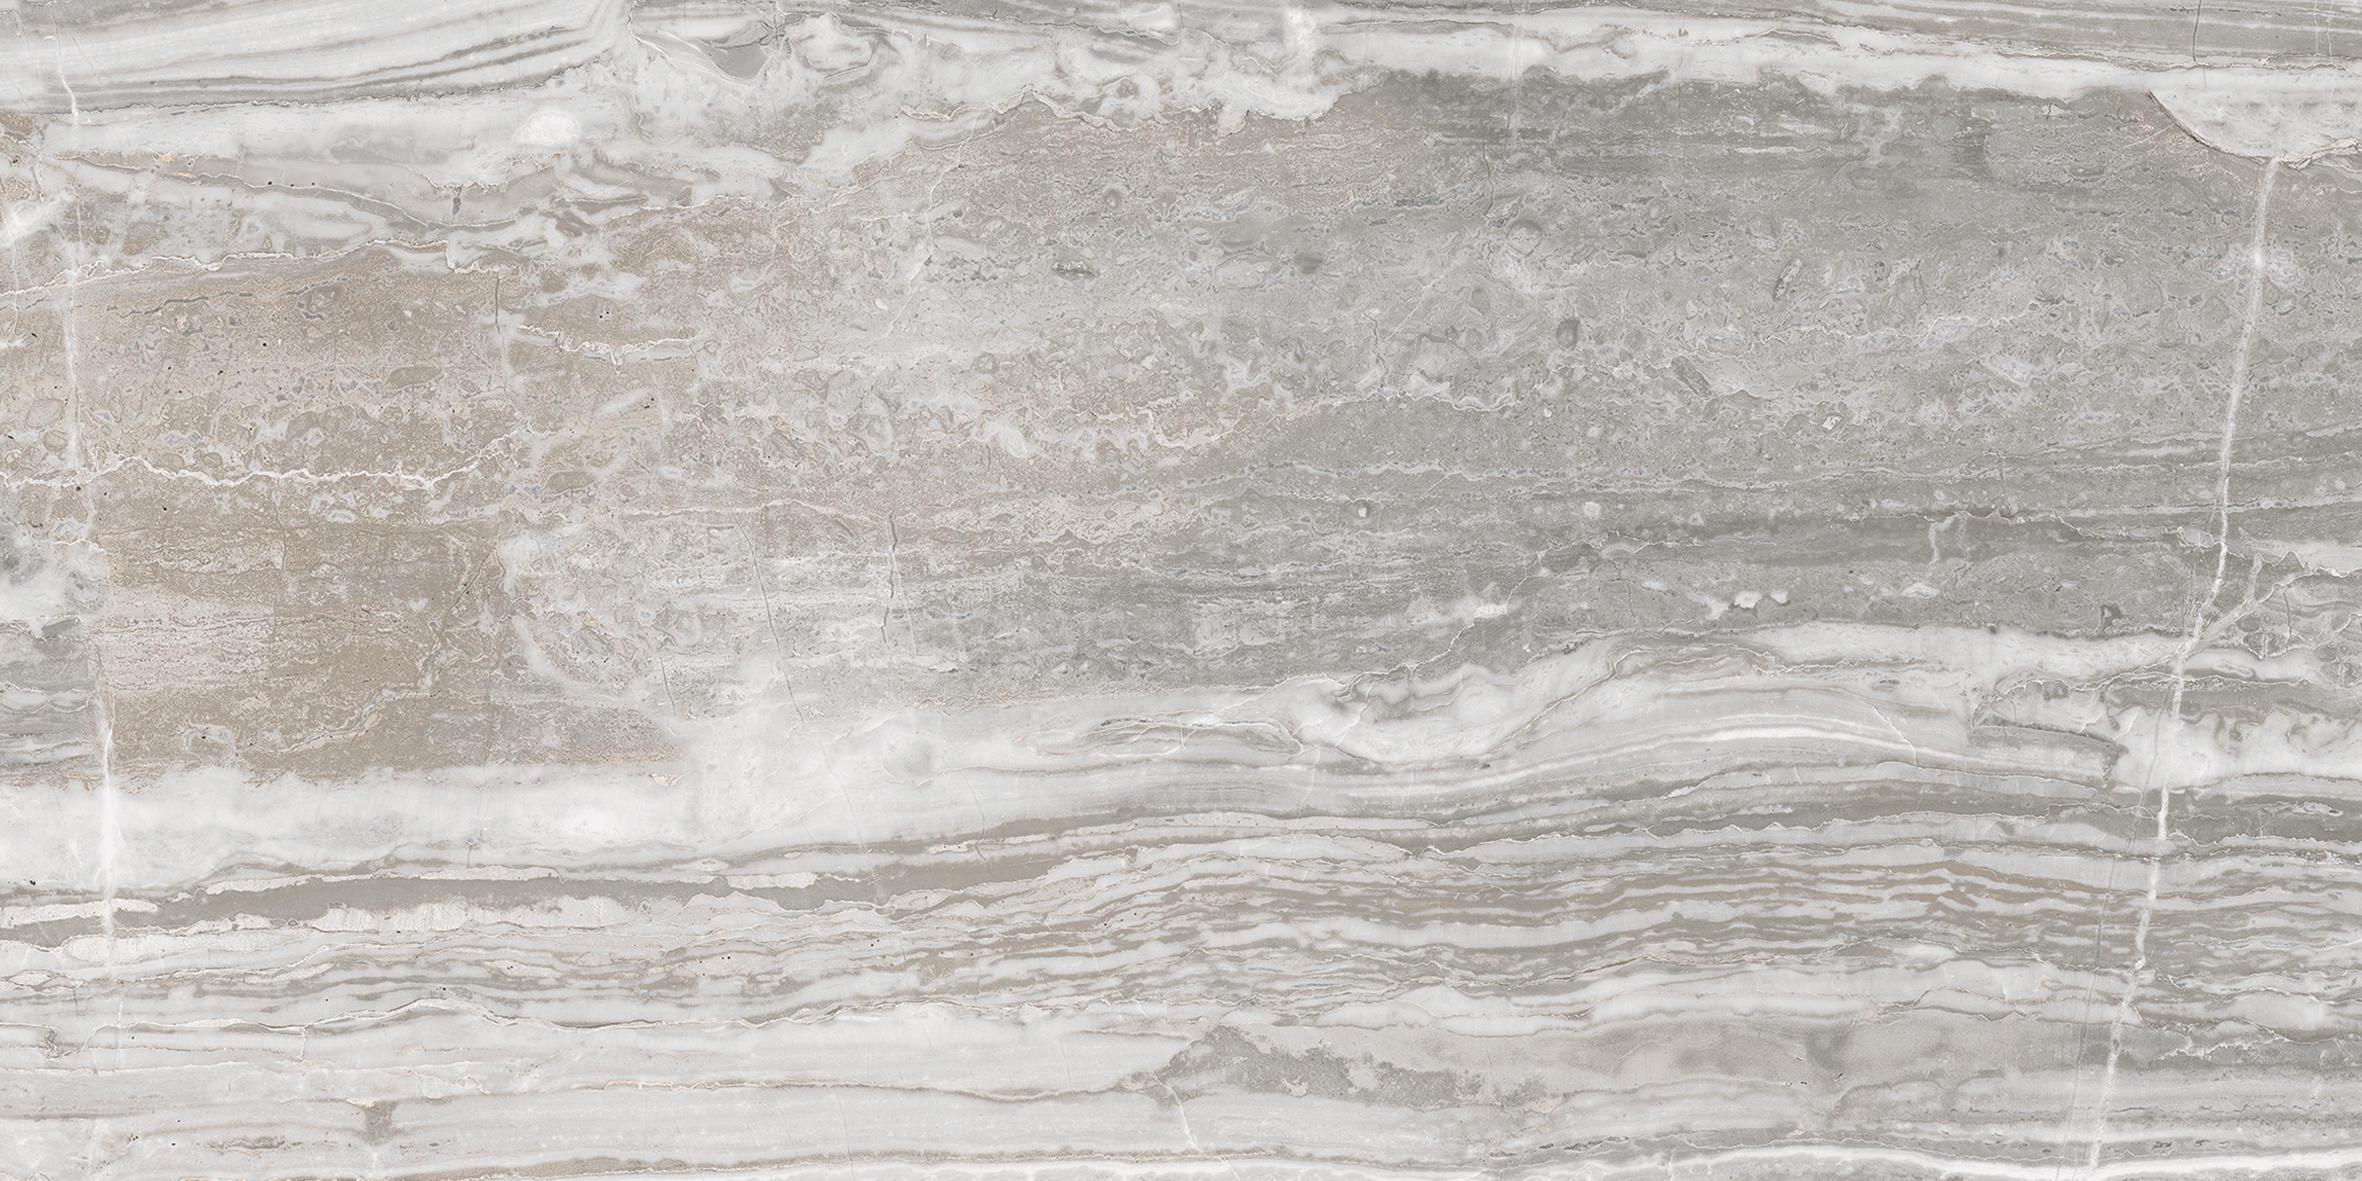 Sensi Arabesque Silver Ceramic Tiles From Abk Group Architonic